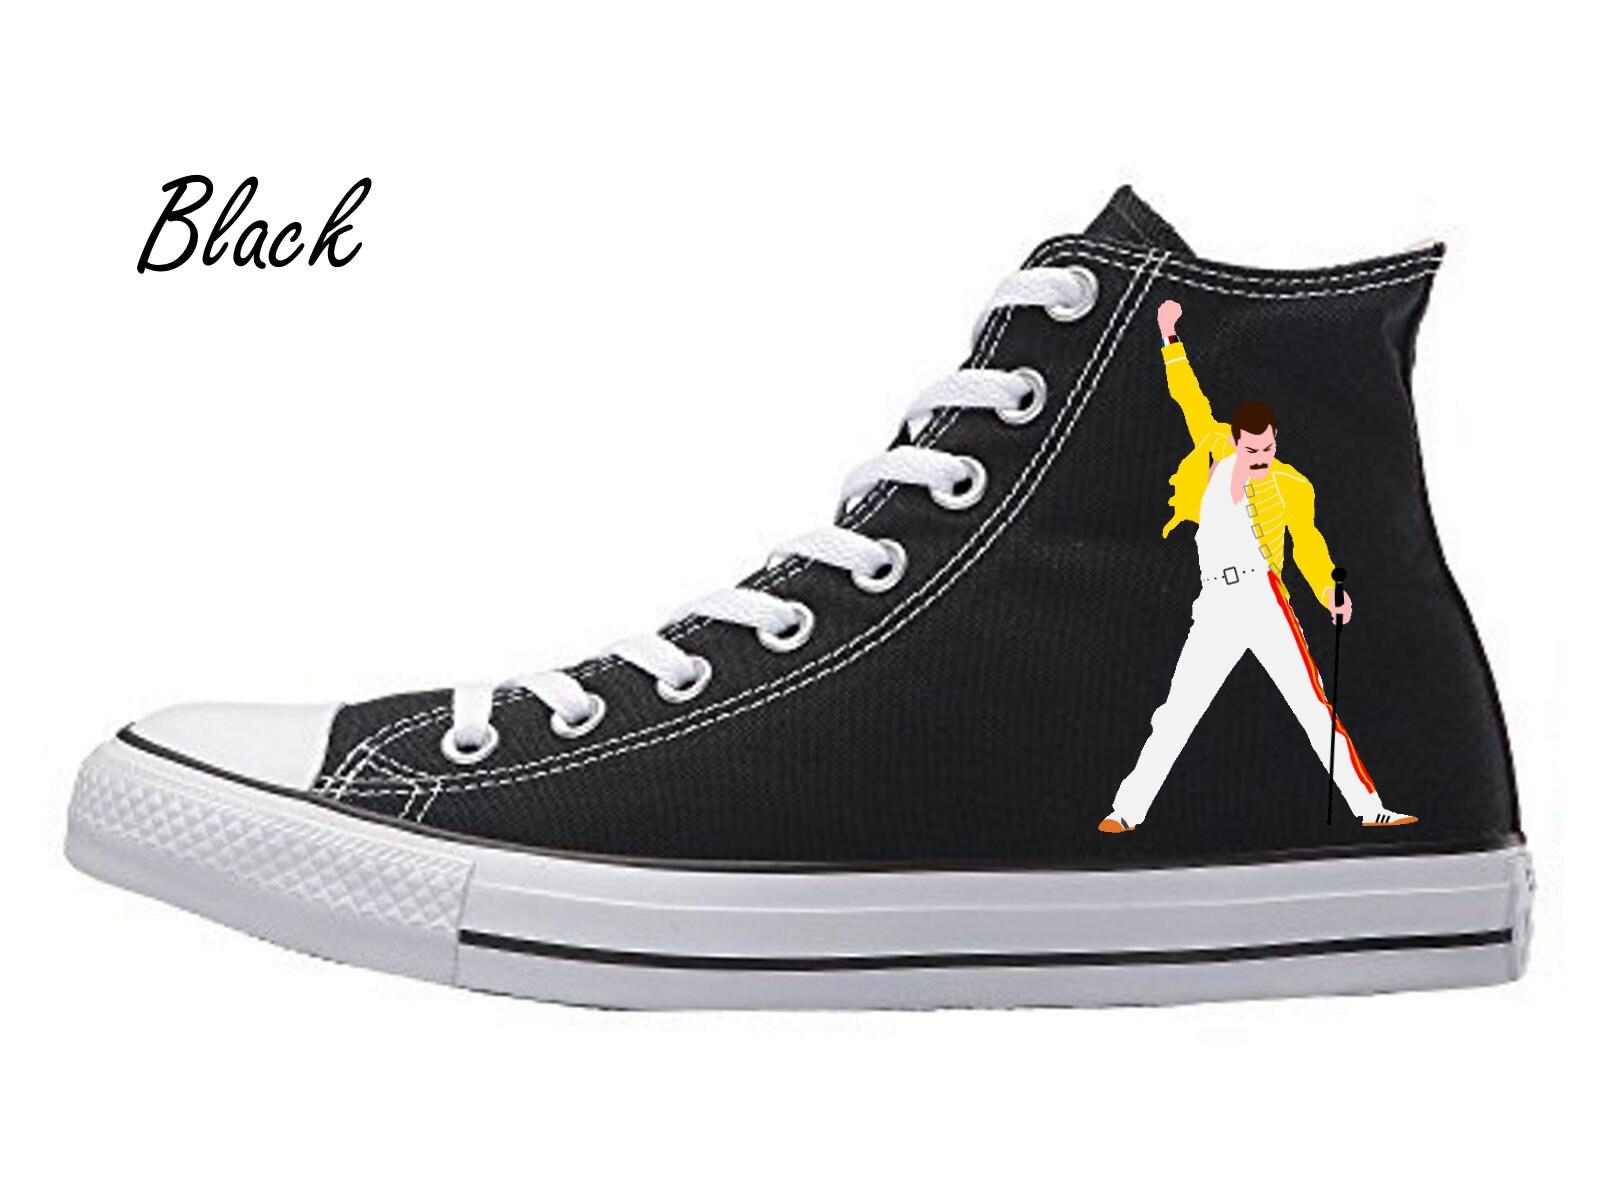 b071e796fc8 Freddie mercury sneakers converse chuck taylor all star high etsy jpg  1600x1200 Harlequin chuck taylors